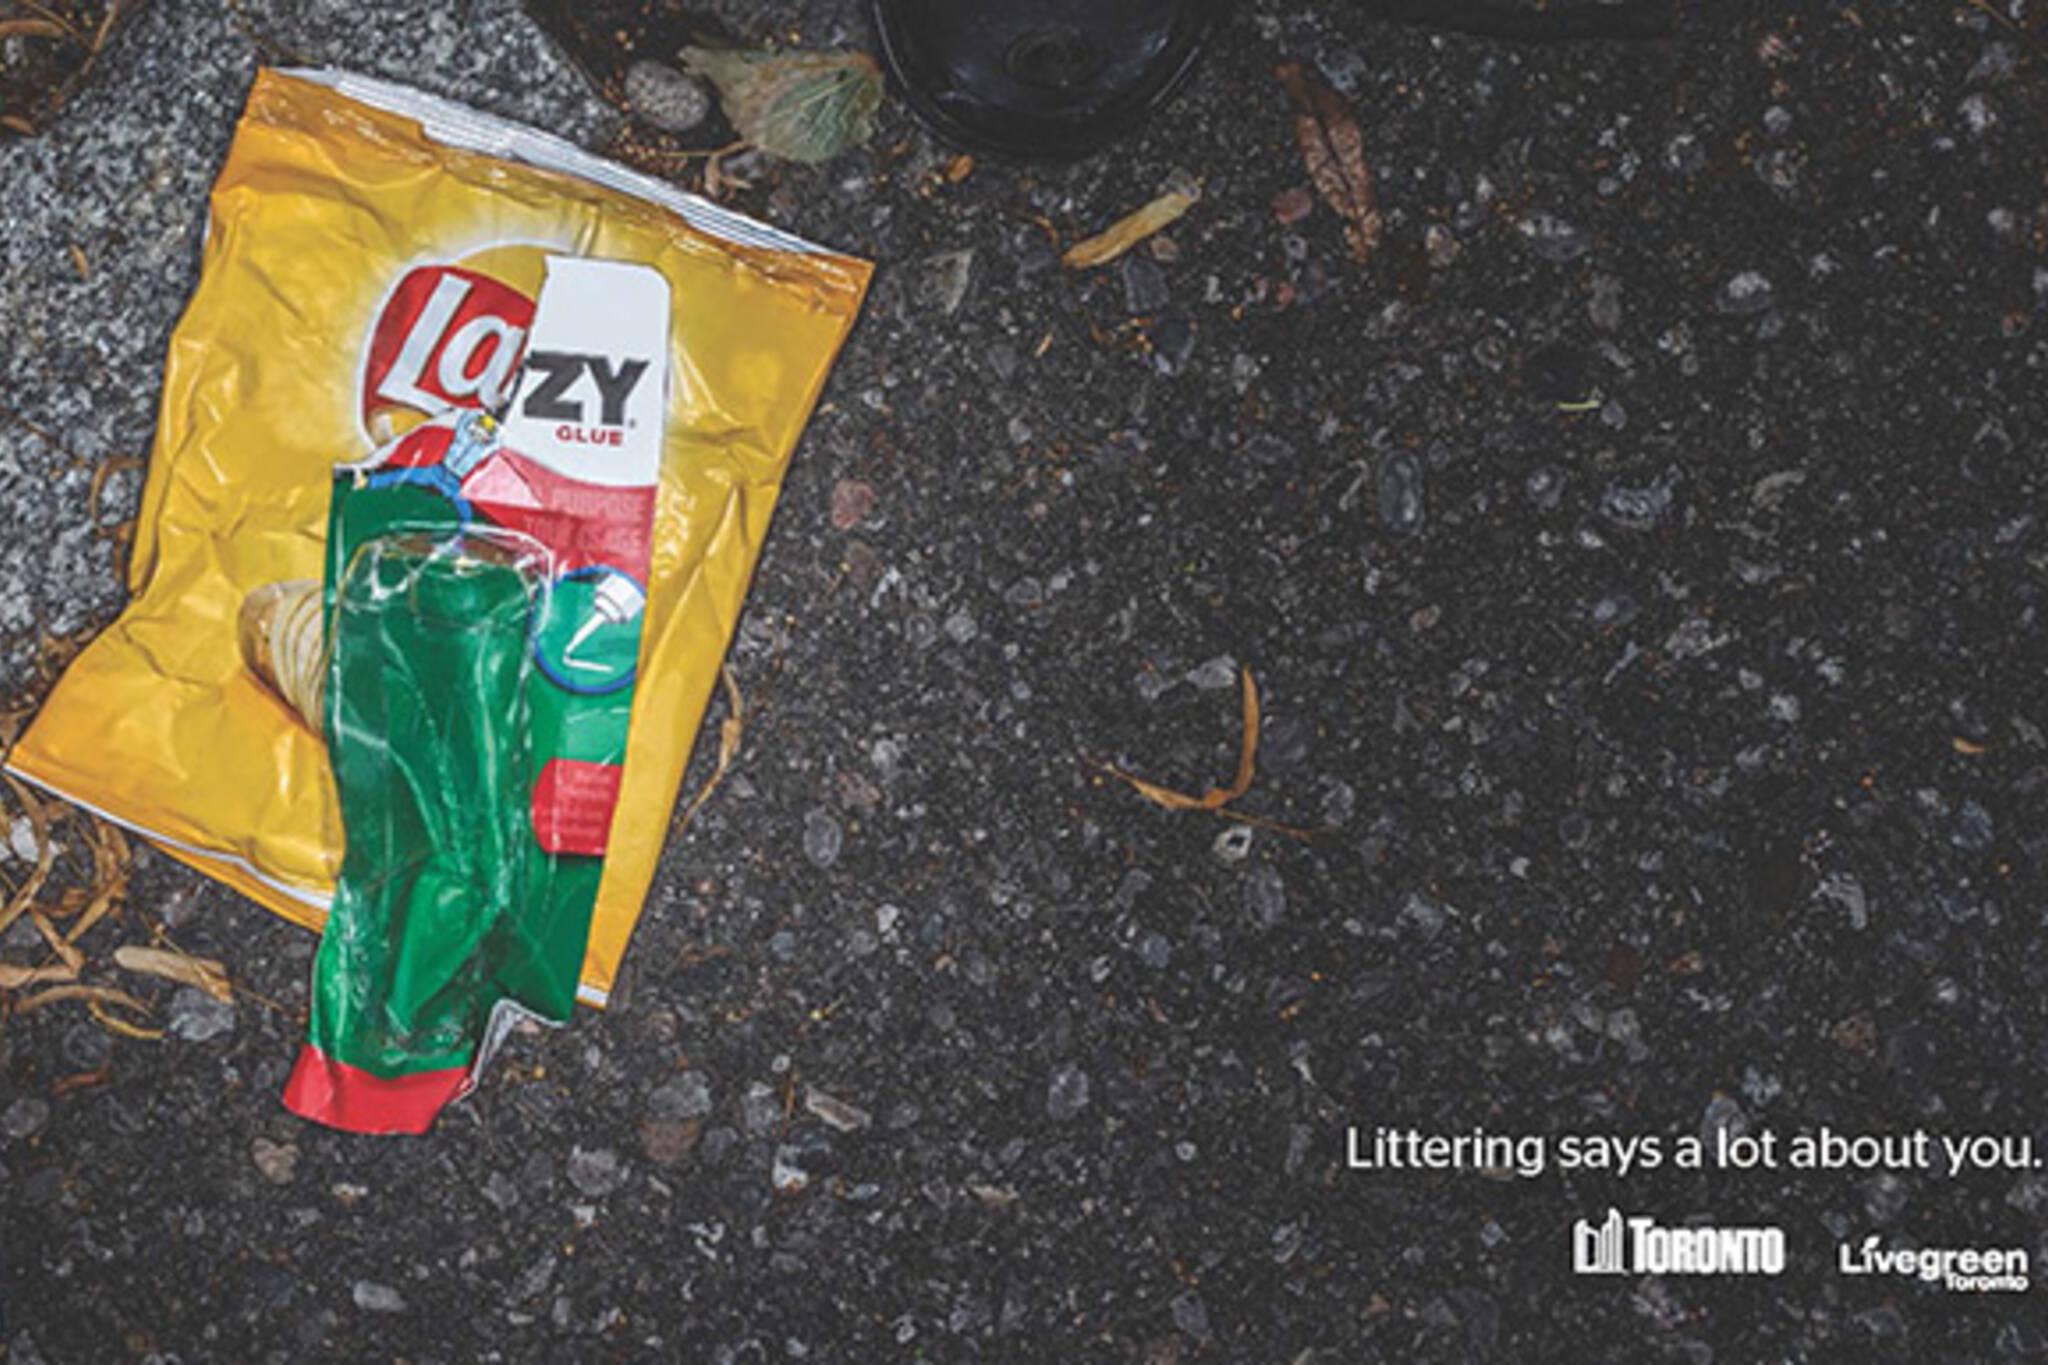 anti litter ads toronto